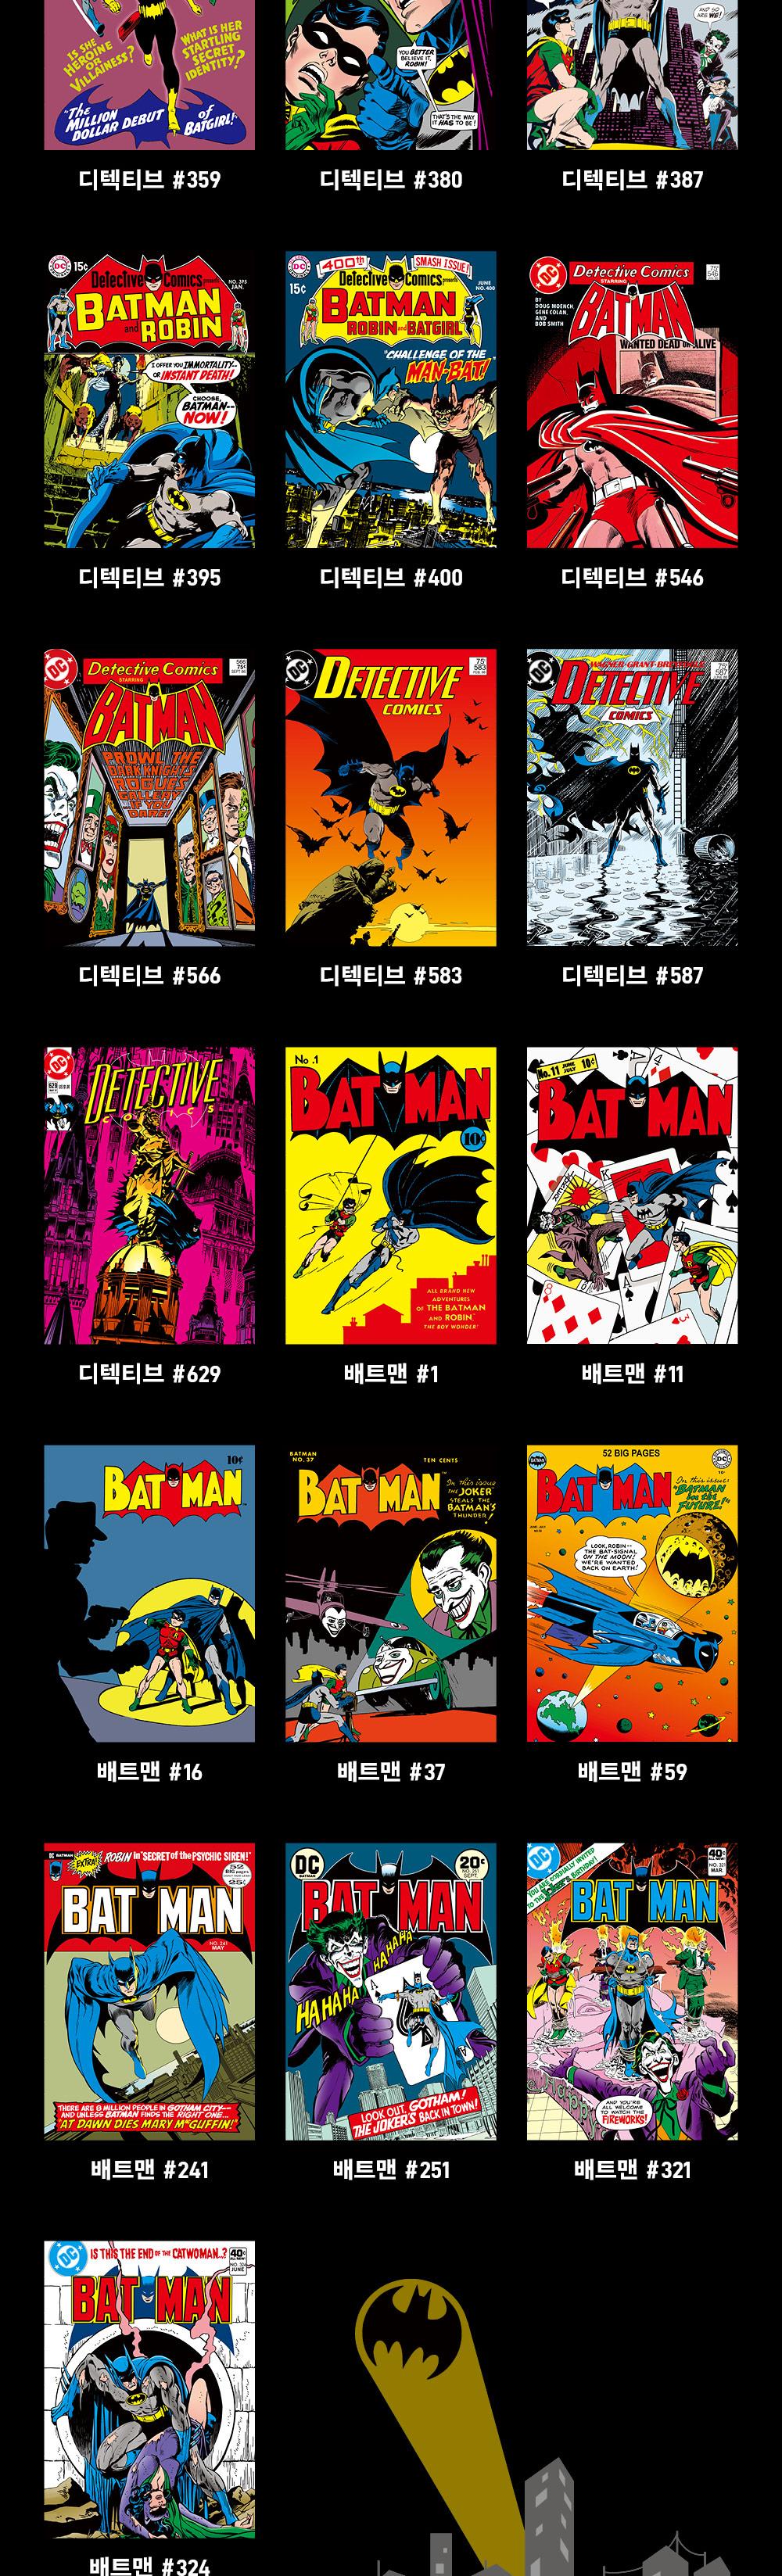 DC코믹스 인테리어 포스터_배트맨_02.jpg